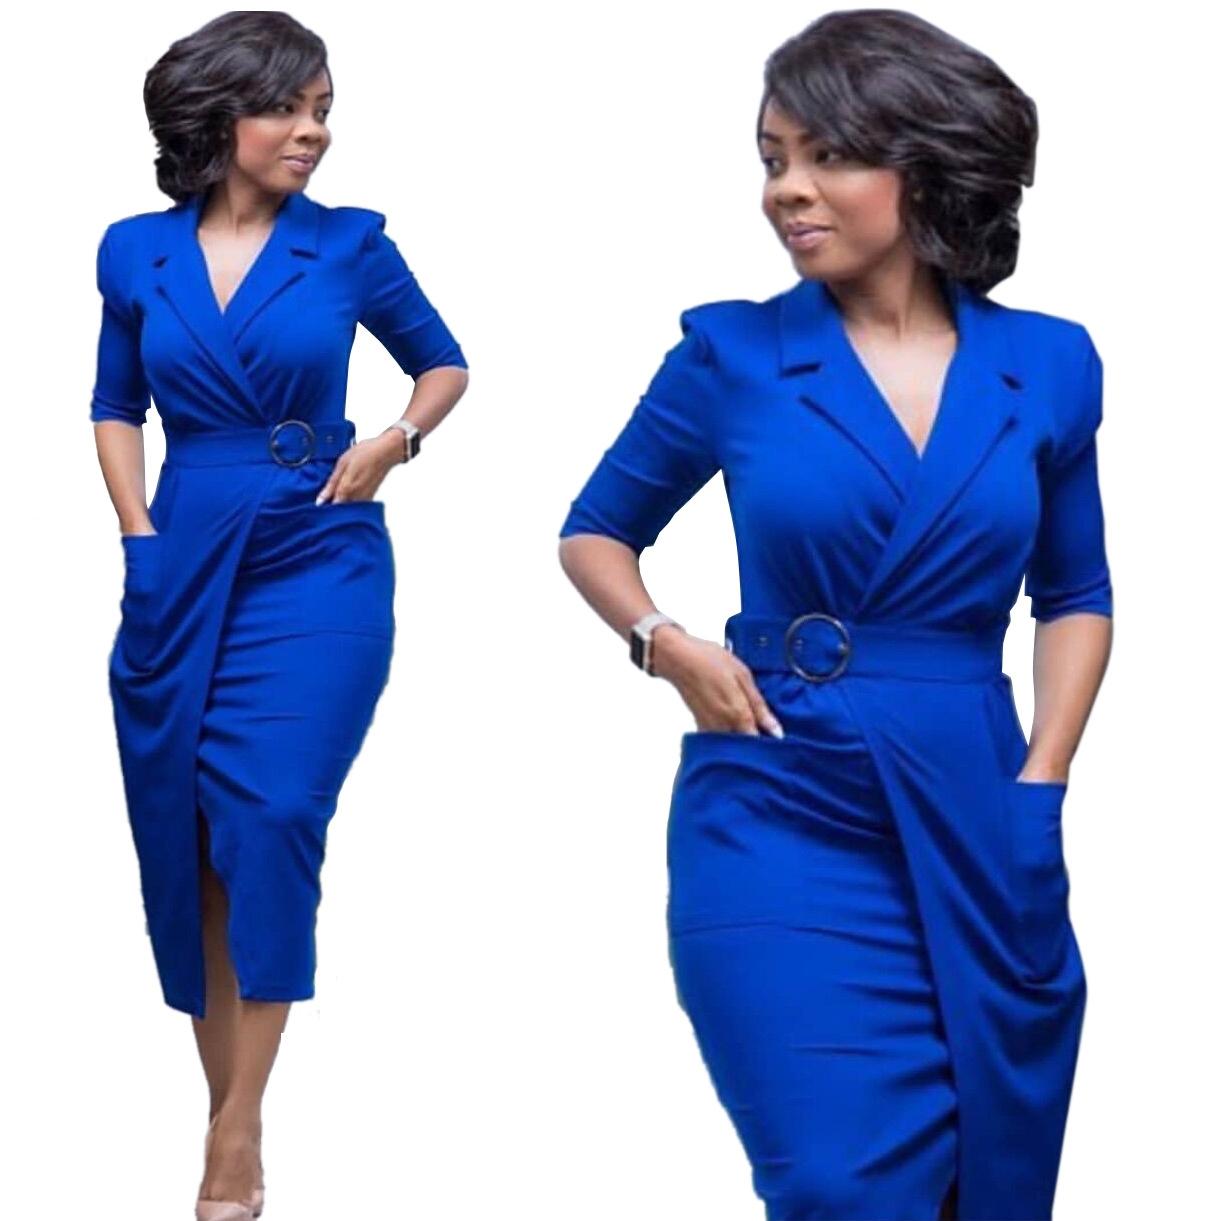 M J Fashion Women Vintage Dresses Elegant Lady Long Sleeve Pencil Dress  Work Office Wear Vestidos m blue  Product No  7724909. Item specifics   Brand  ea1c16396b5d